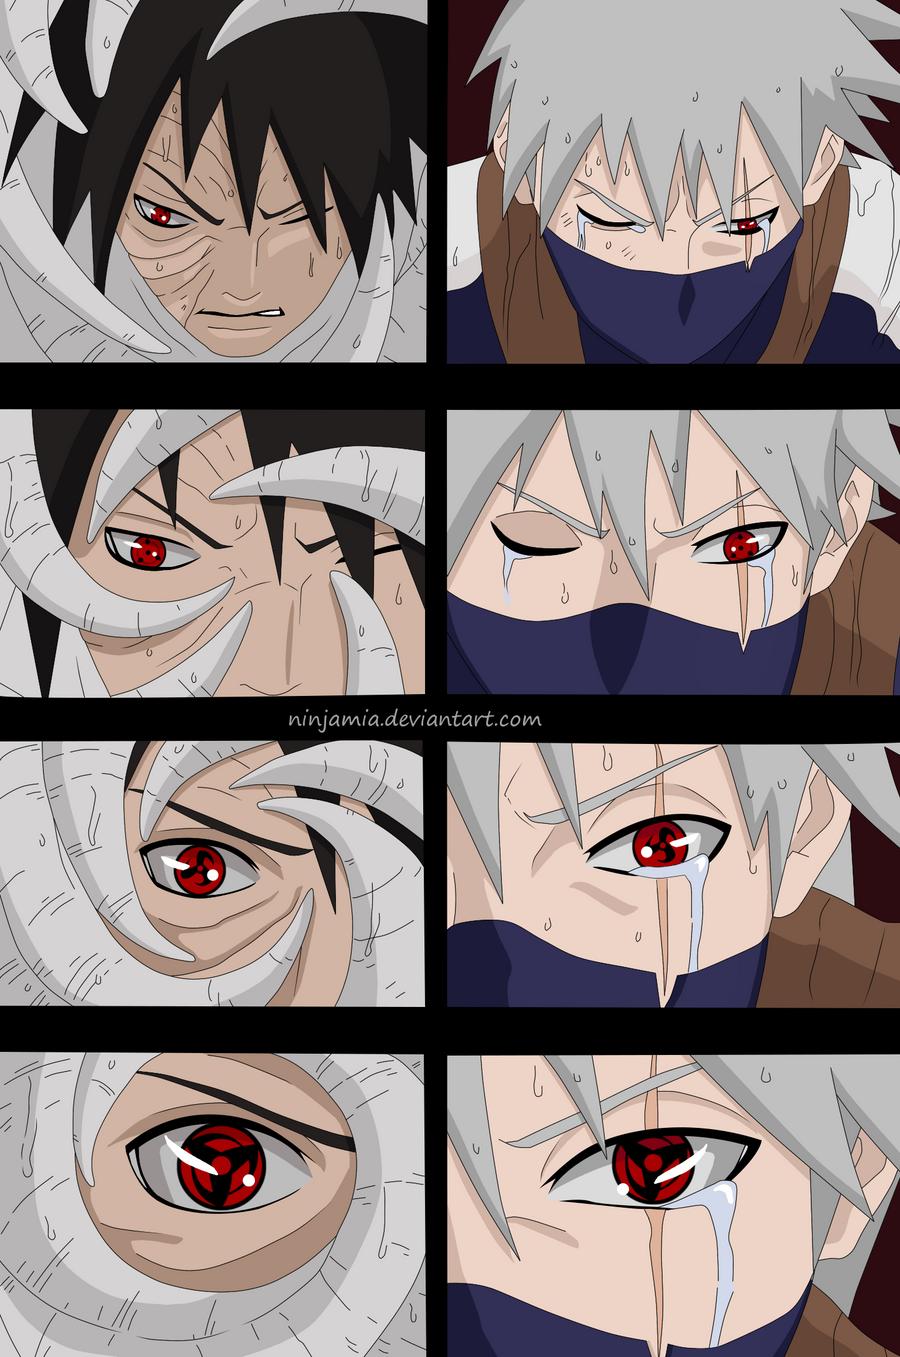 Naruto 605: Man... Kakashi Mangekyou Sharingan Contacts